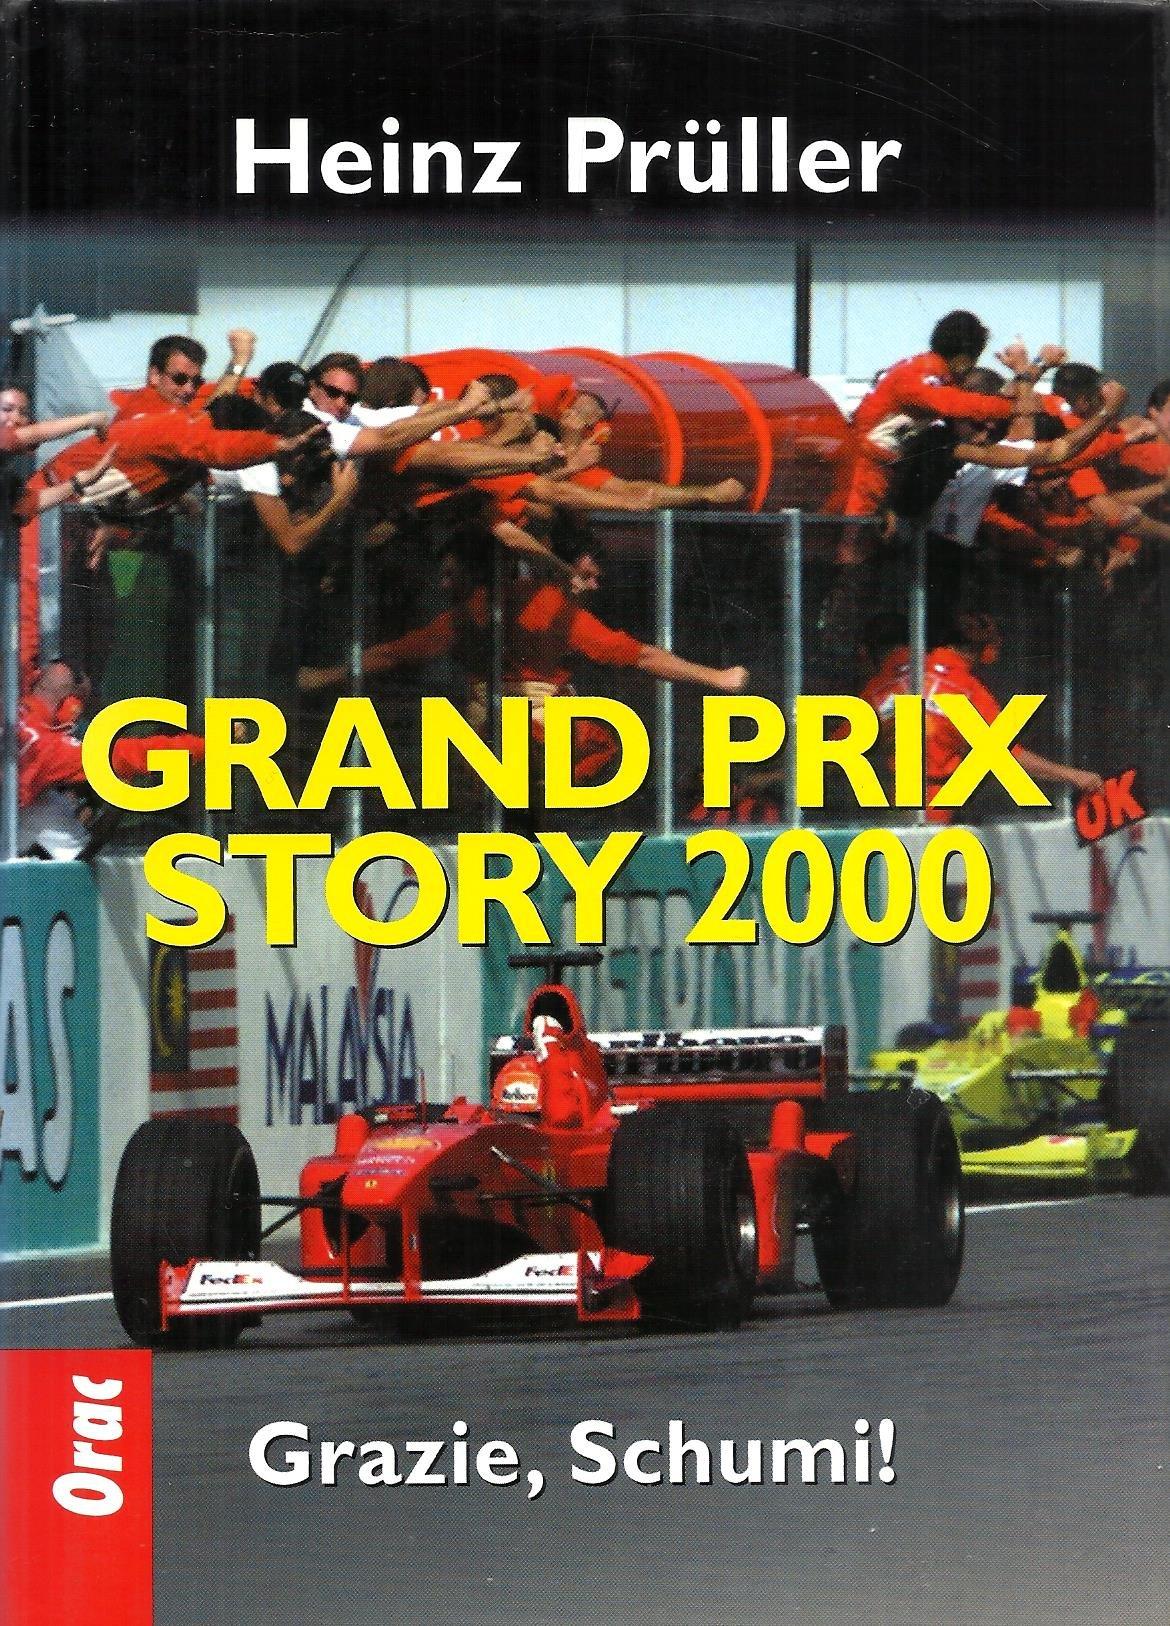 Grand Prix Story, 2000